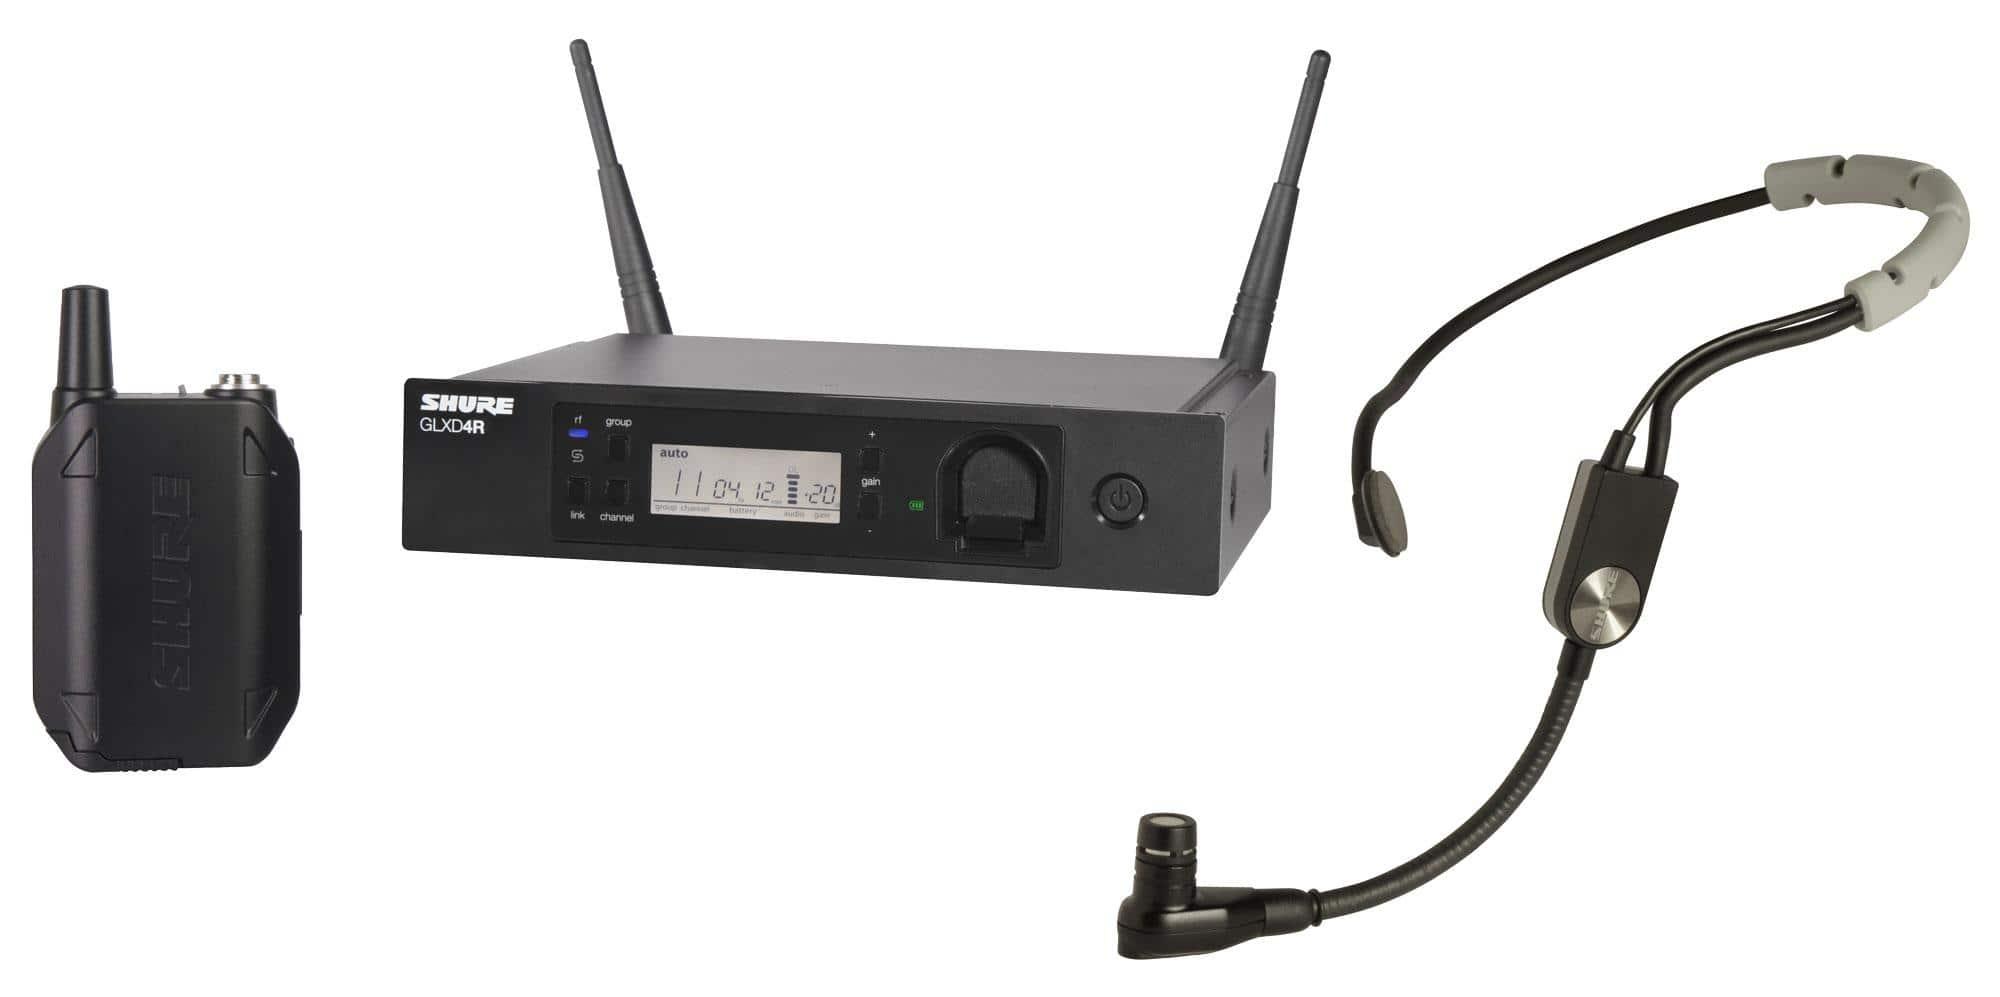 Shure GLXD14R|SM35 Digitales Funksystem mit SM35 Headset